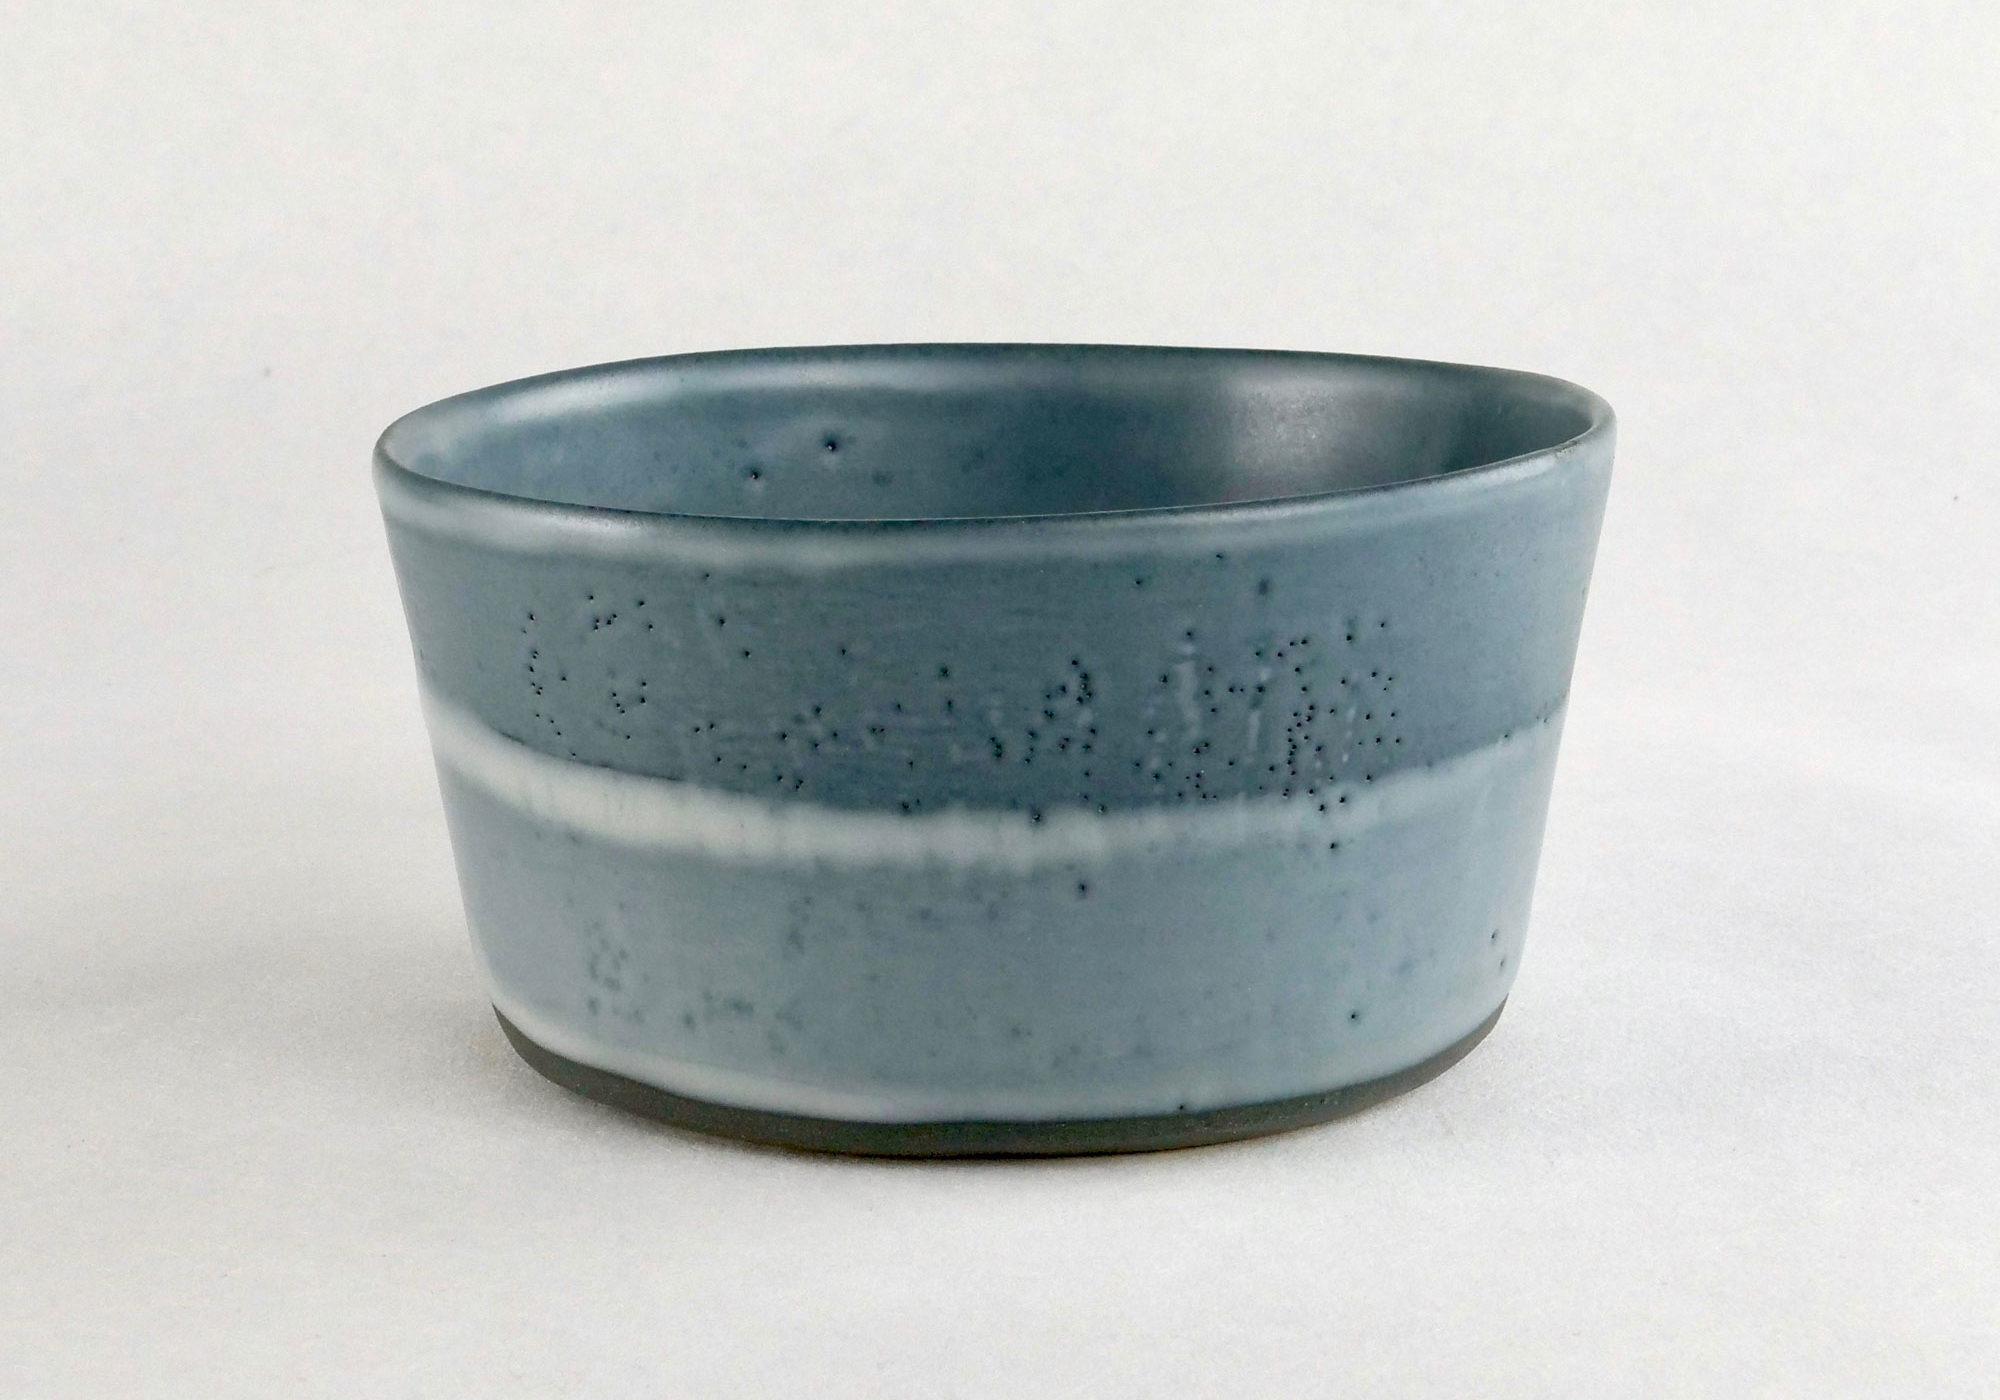 02-bol-aline-lafollie-ceramique-poterie